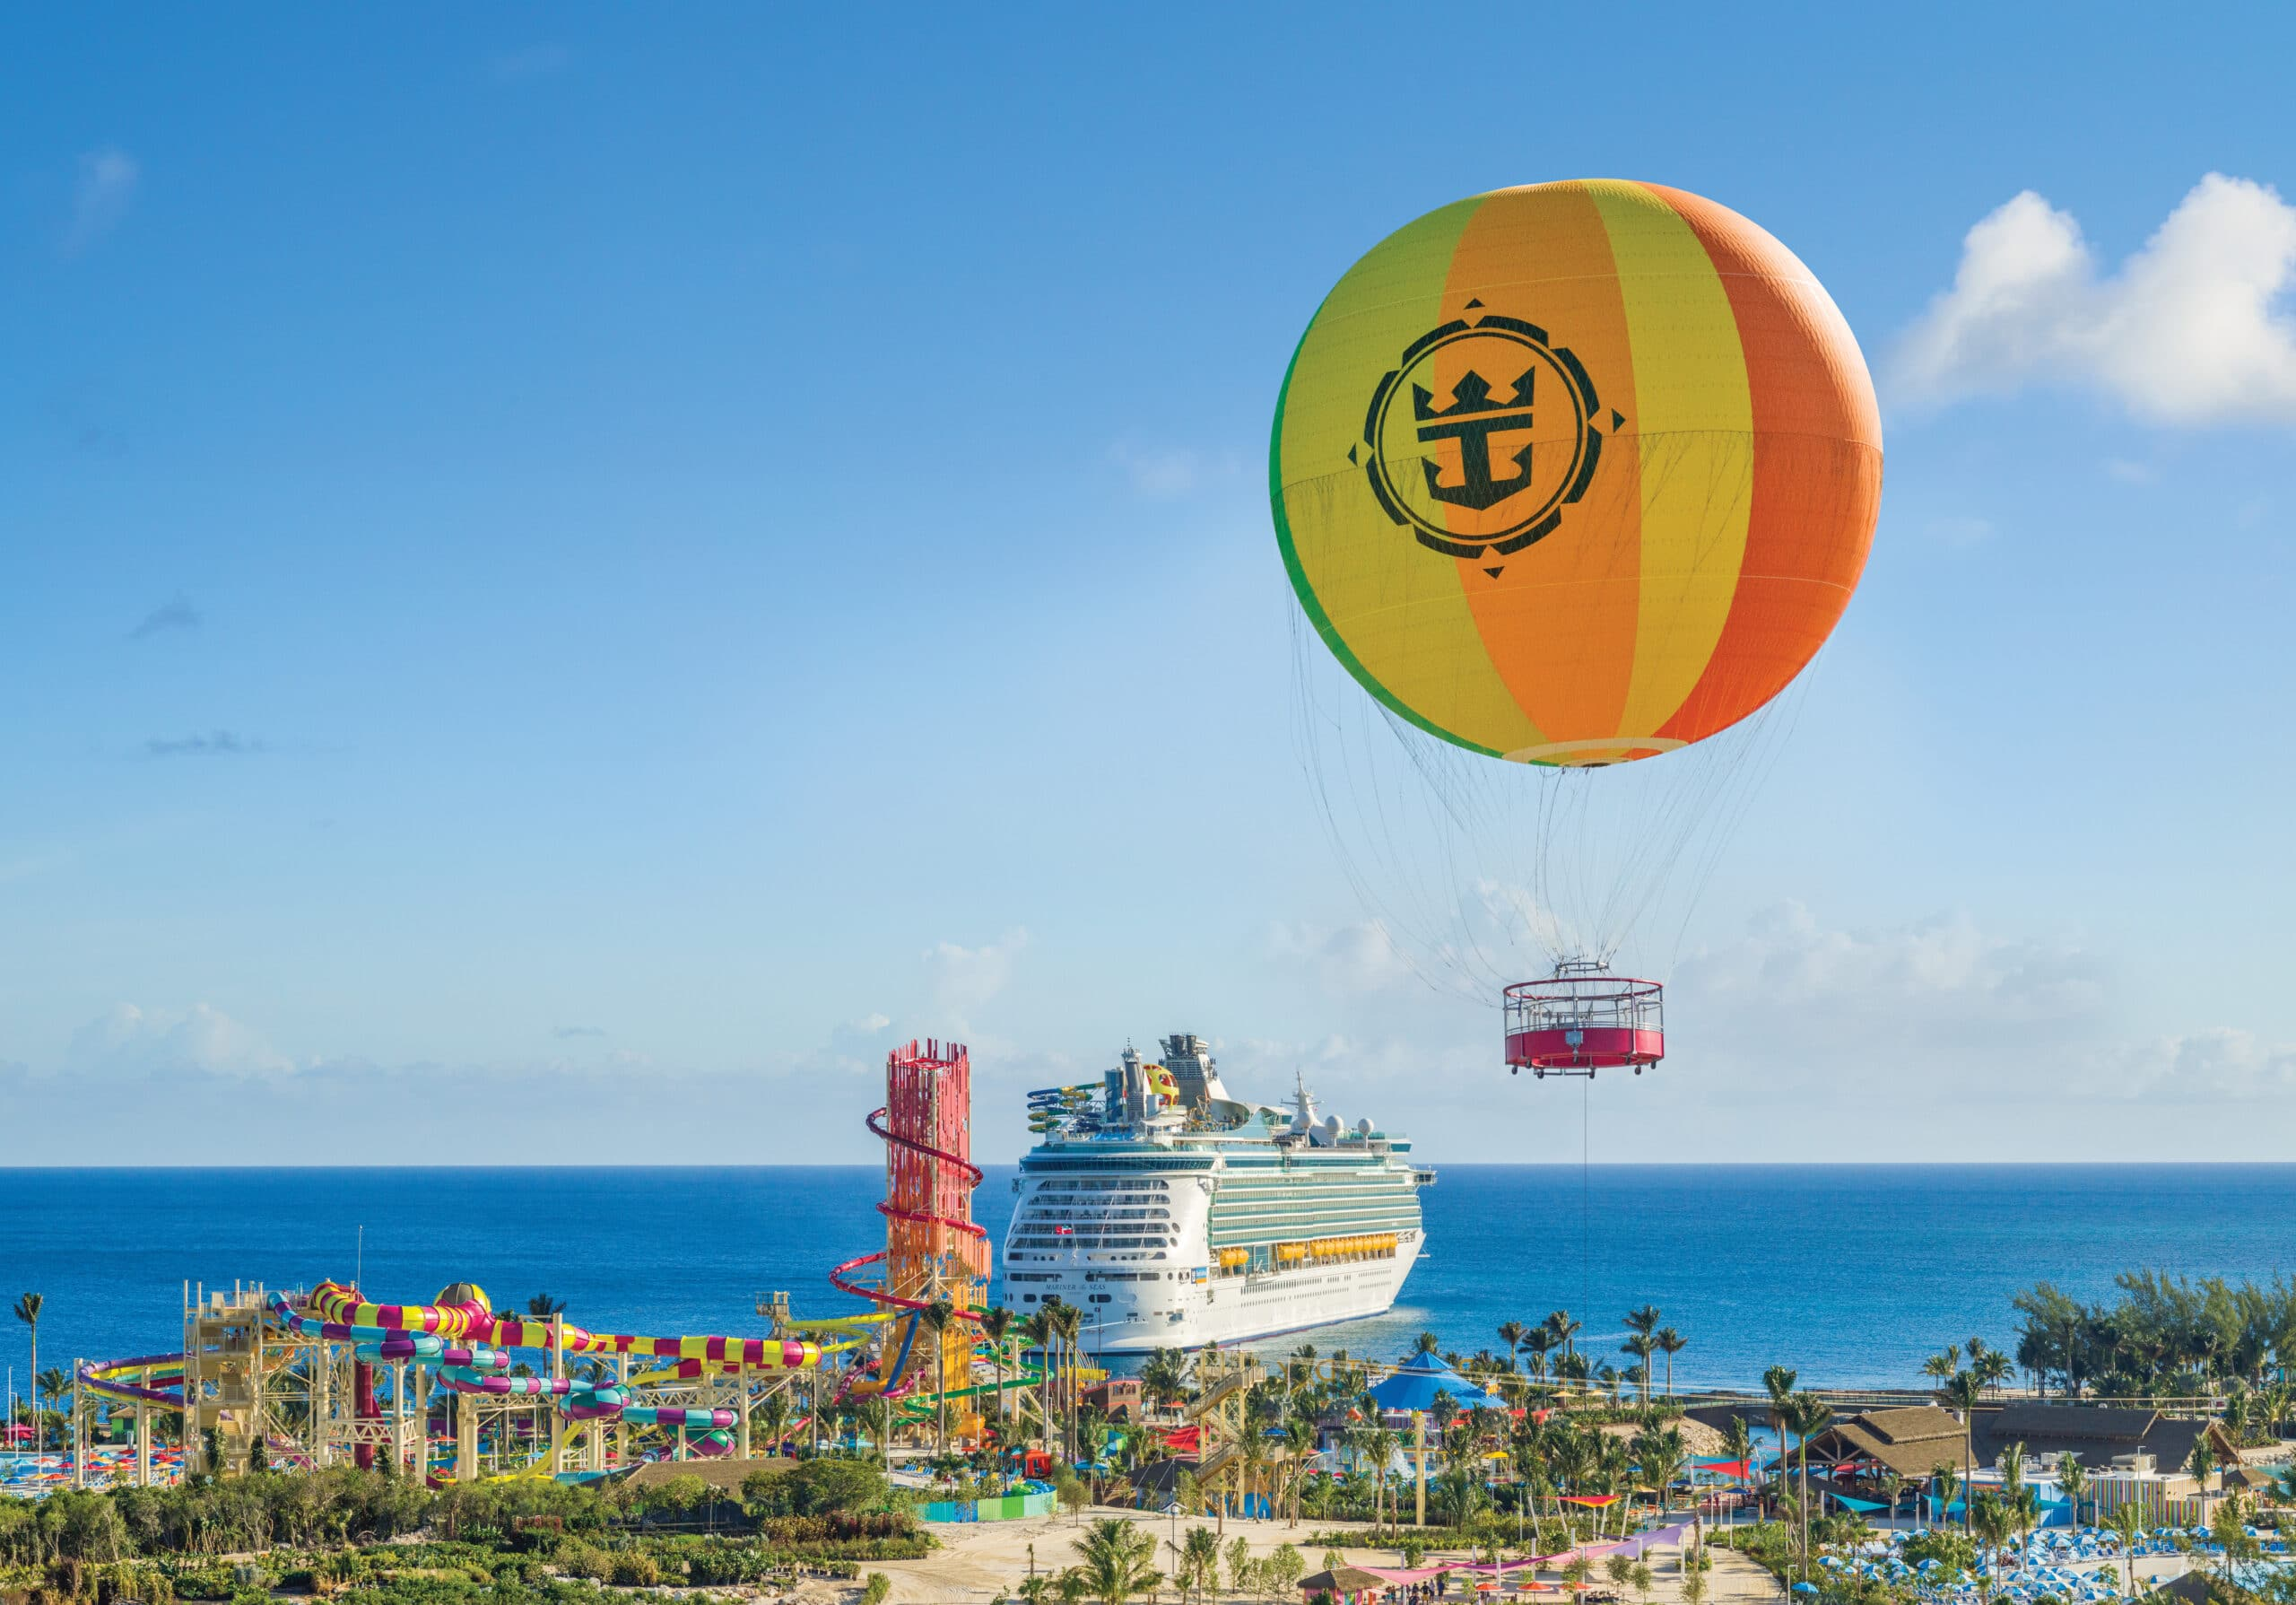 Royal-Caribbean-Mariner-of-the-Seas-Cococay